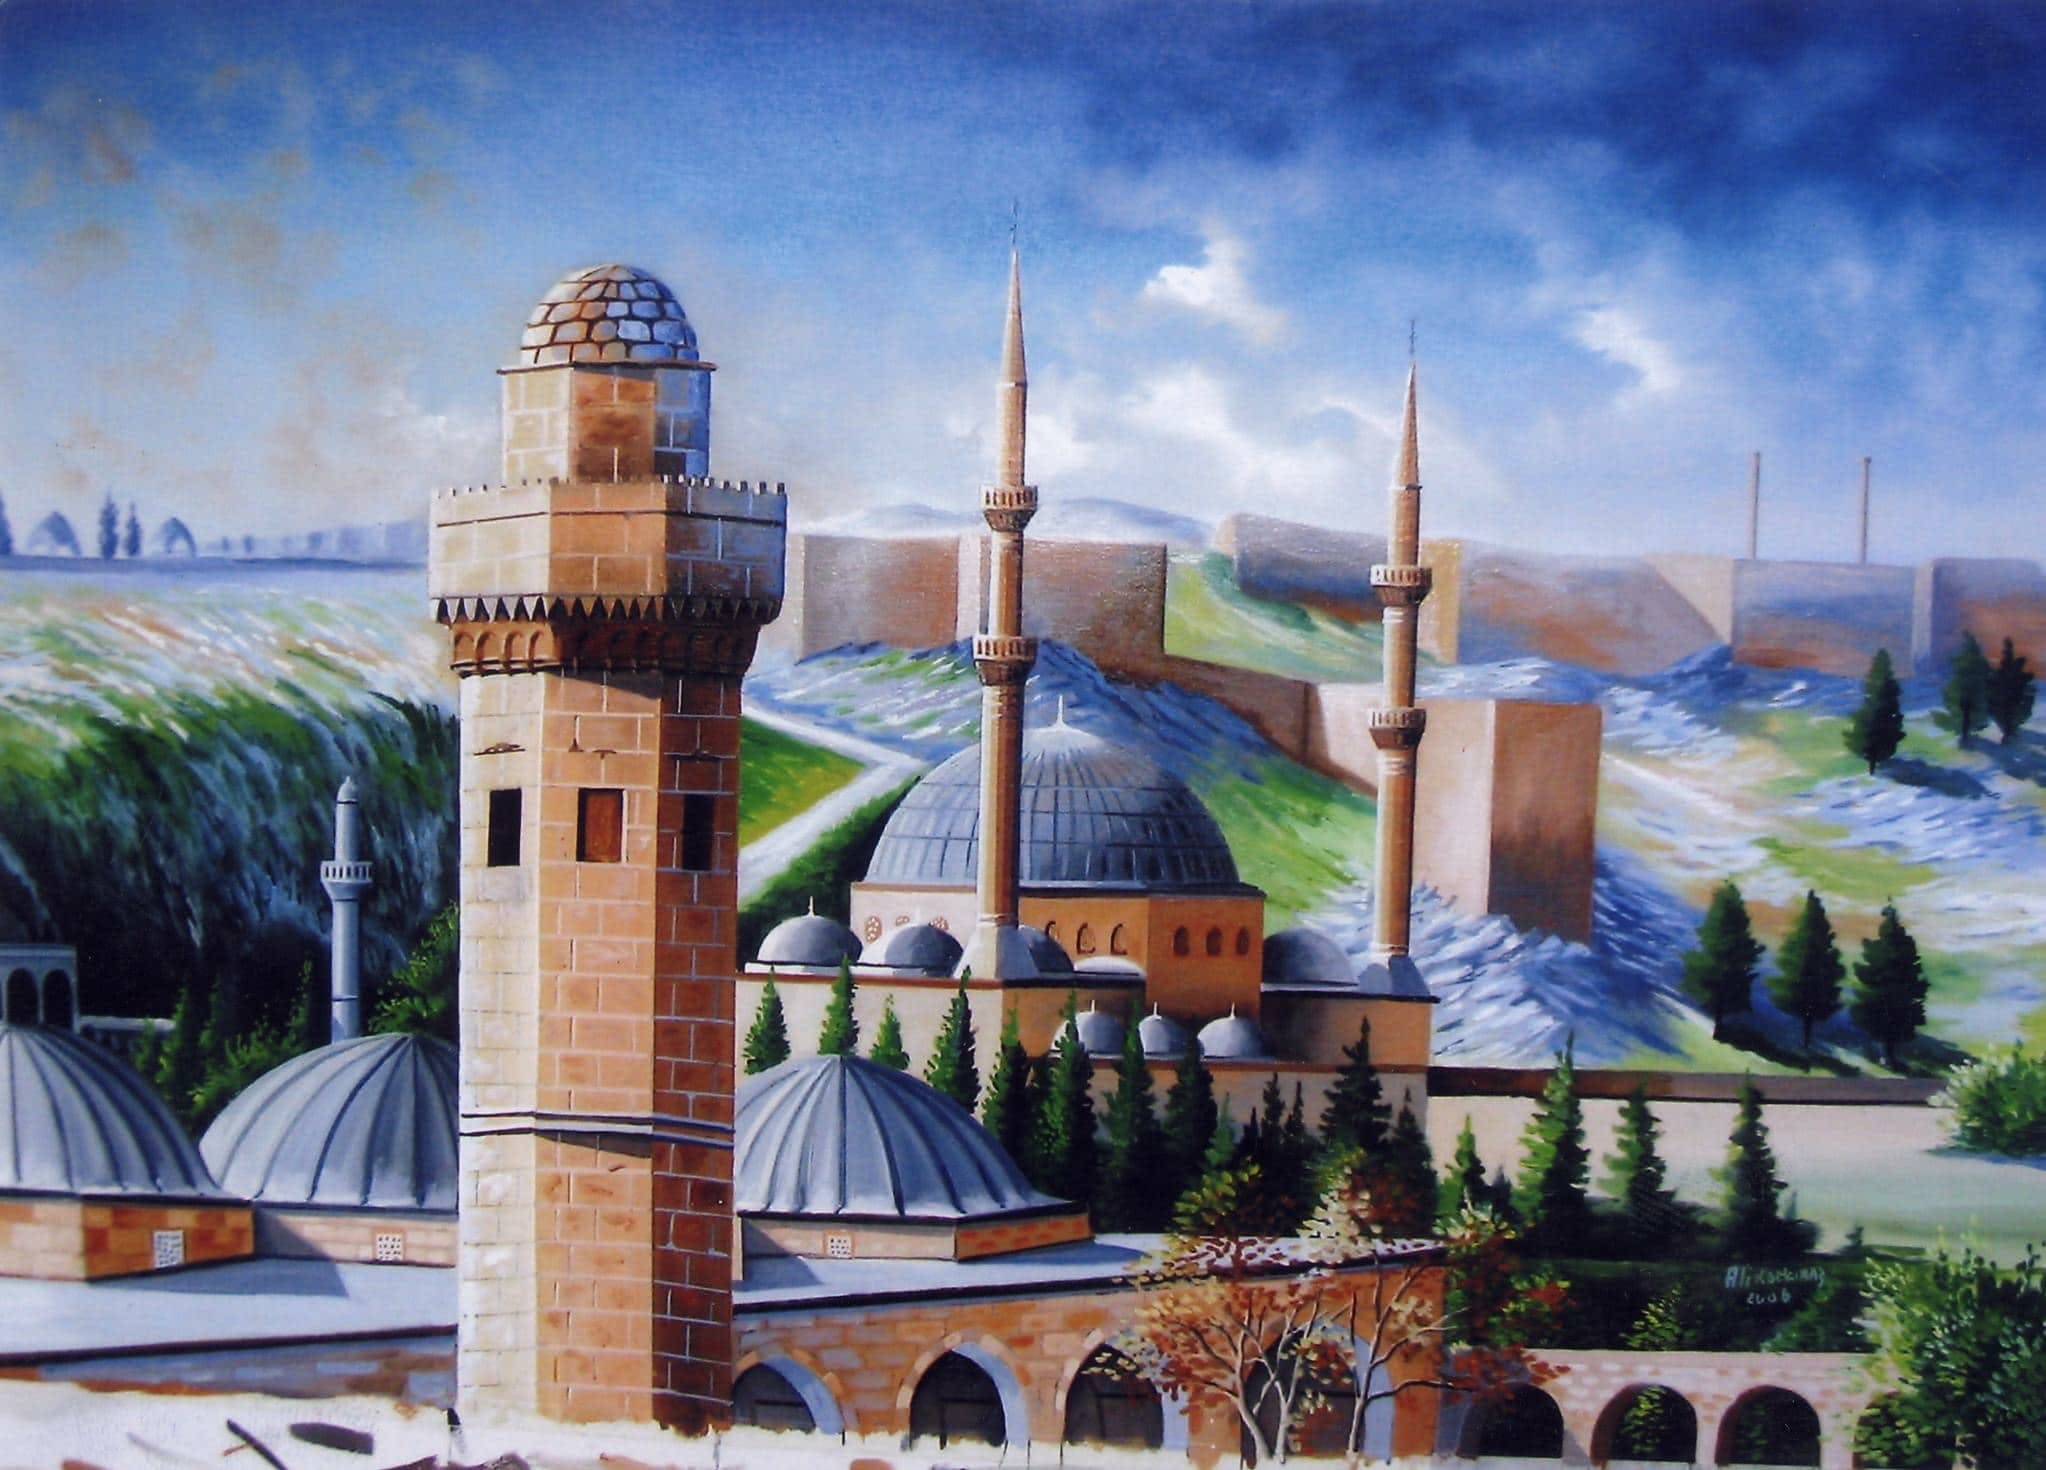 Free stock photo of Şanlıurfa, Balıklıgöl, Dergah, watercolor painting